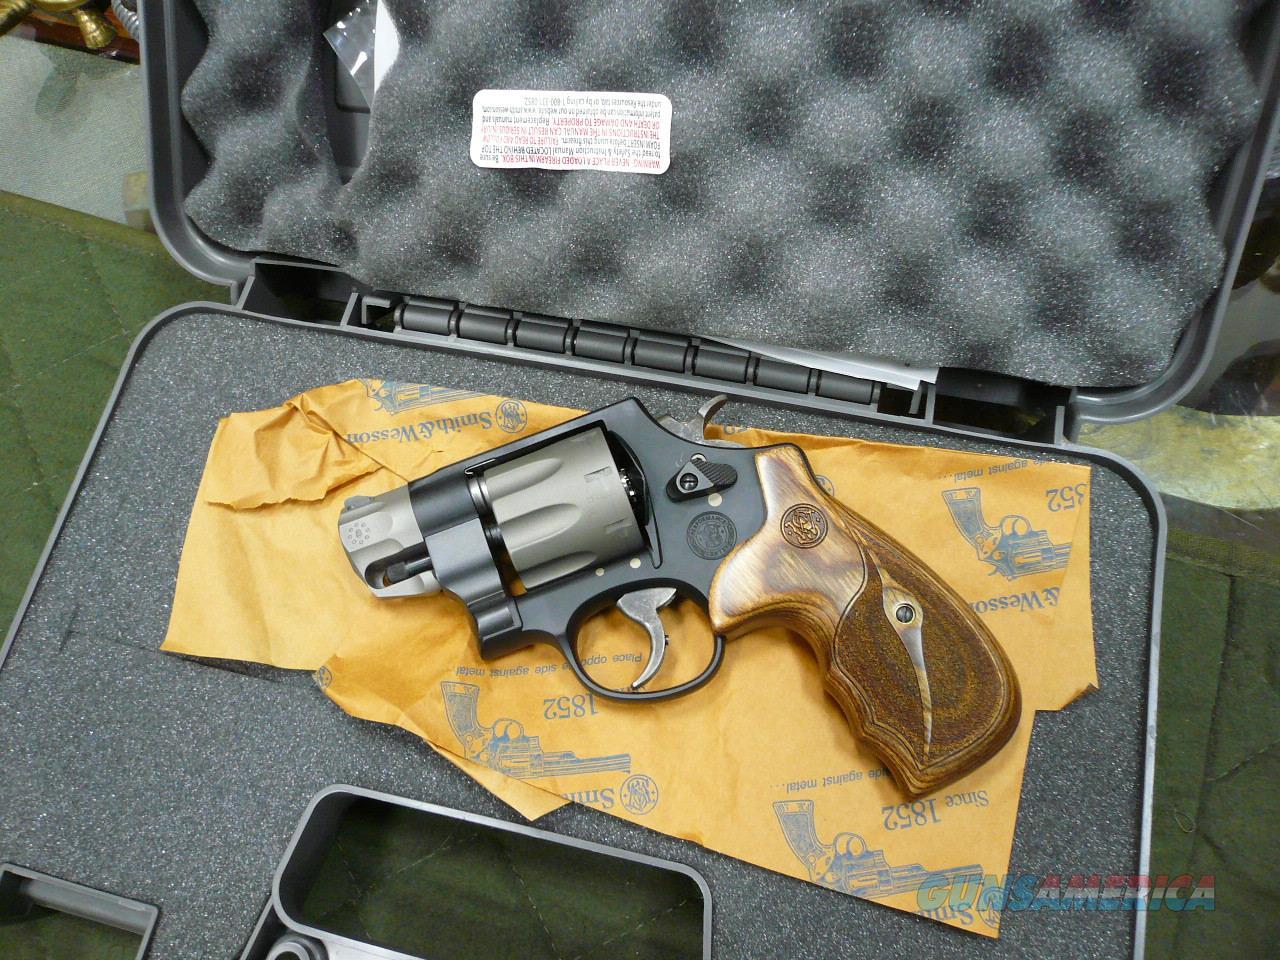 Model-327PC 357mag 8-shots  Guns > Pistols > Smith & Wesson Revolvers > Performance Center